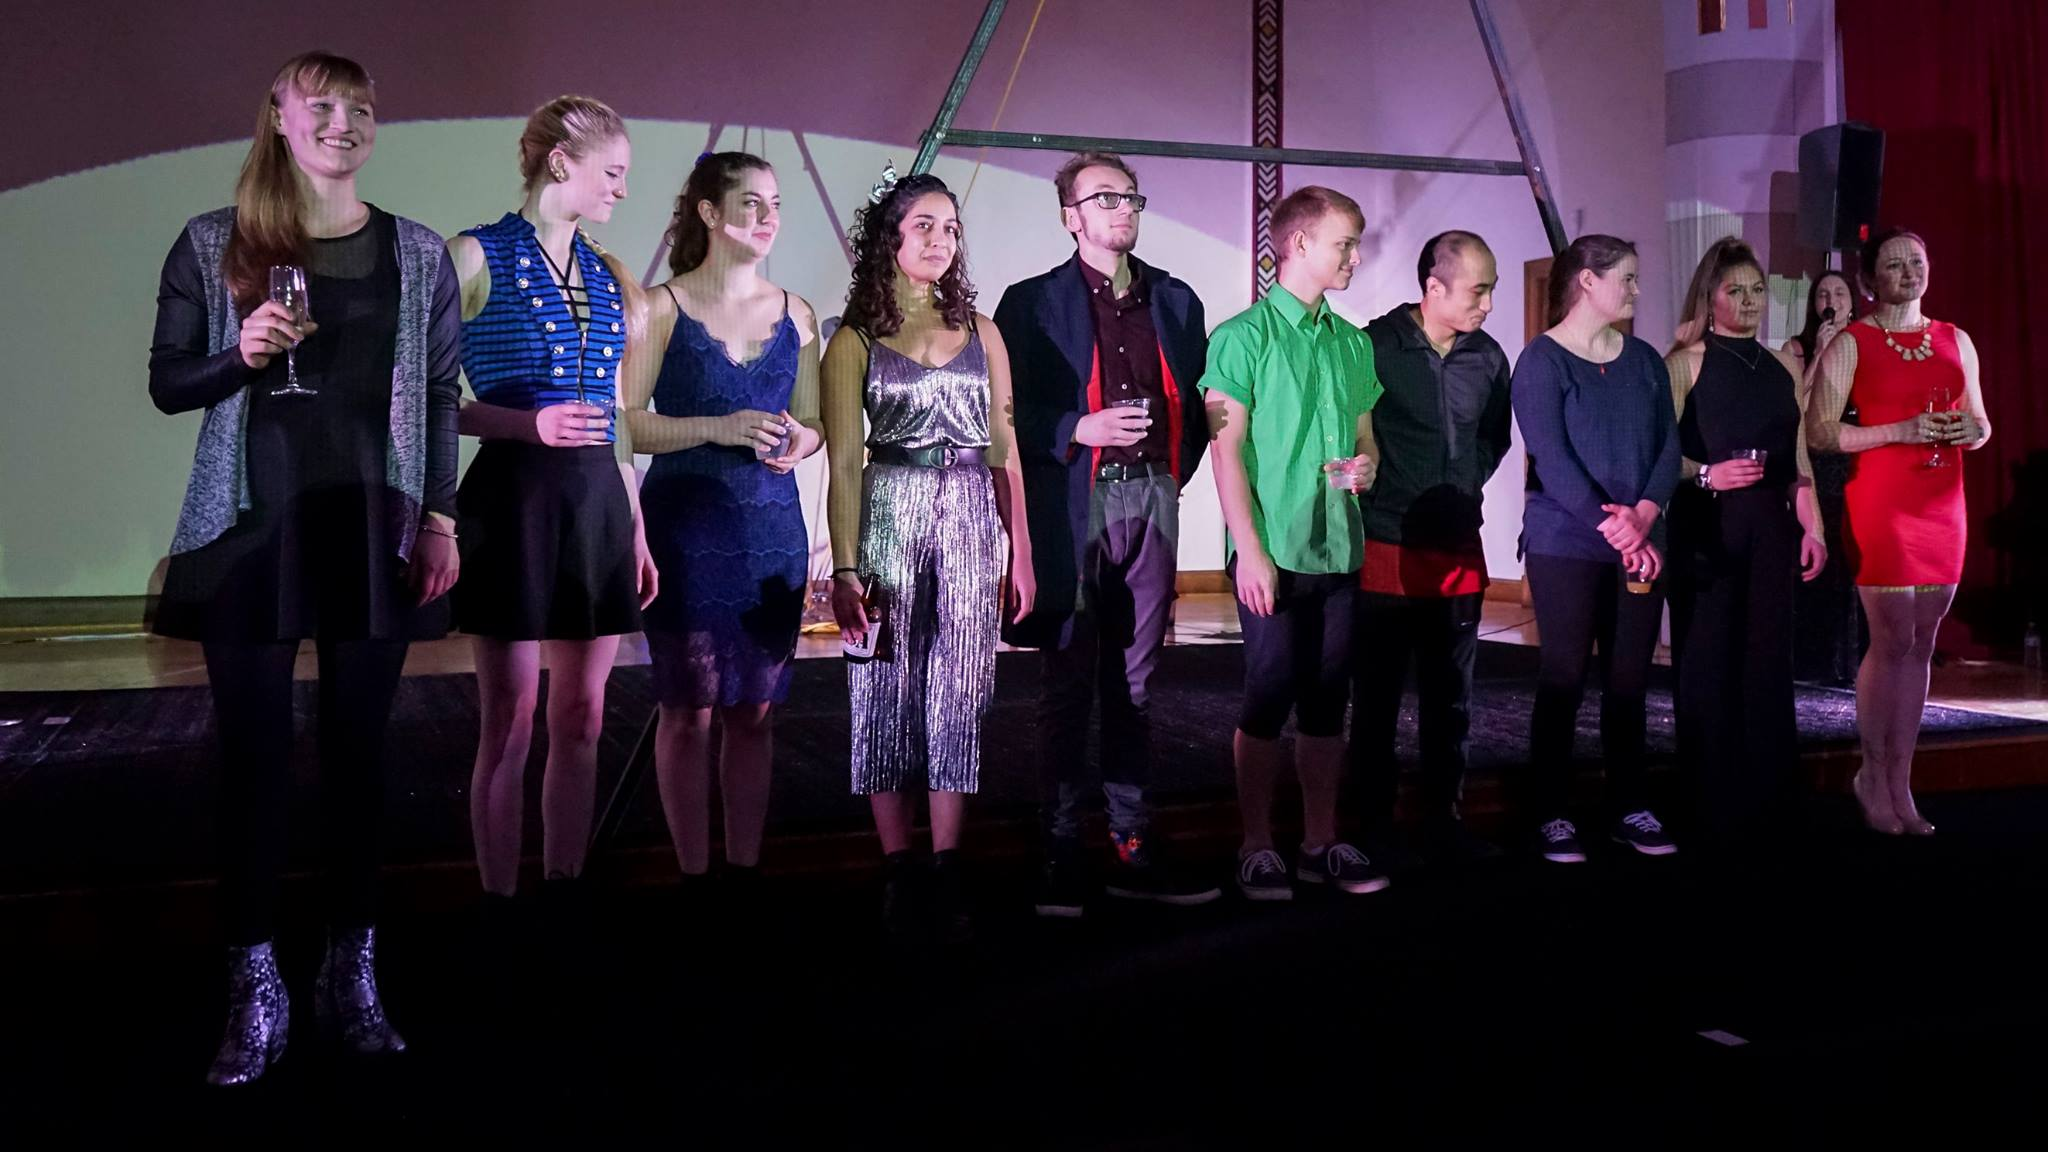 Circadium Class 1: Viola, Luna, Maya, Tara, Stephen, Zak, Cao, Delaney, Celeste, and me!